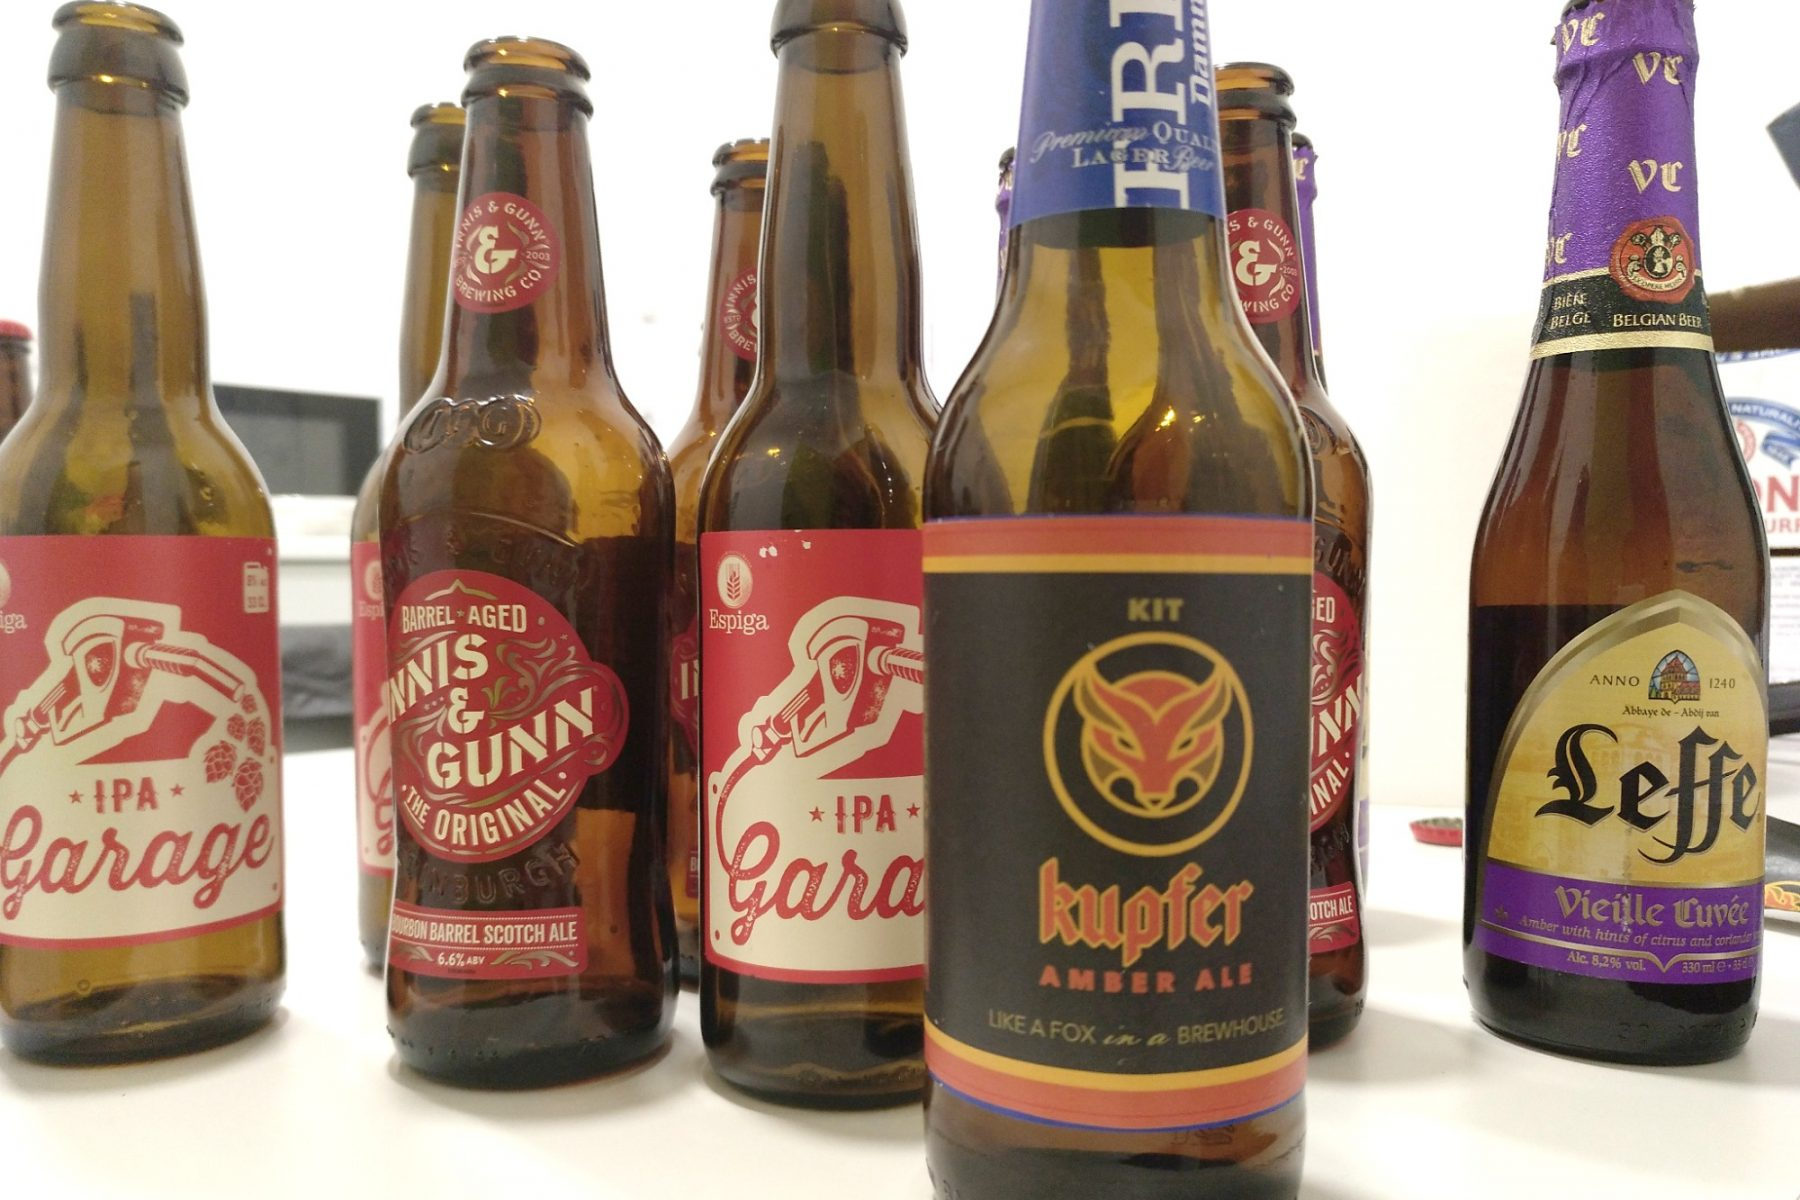 Cata de cervezas Beer Tasting